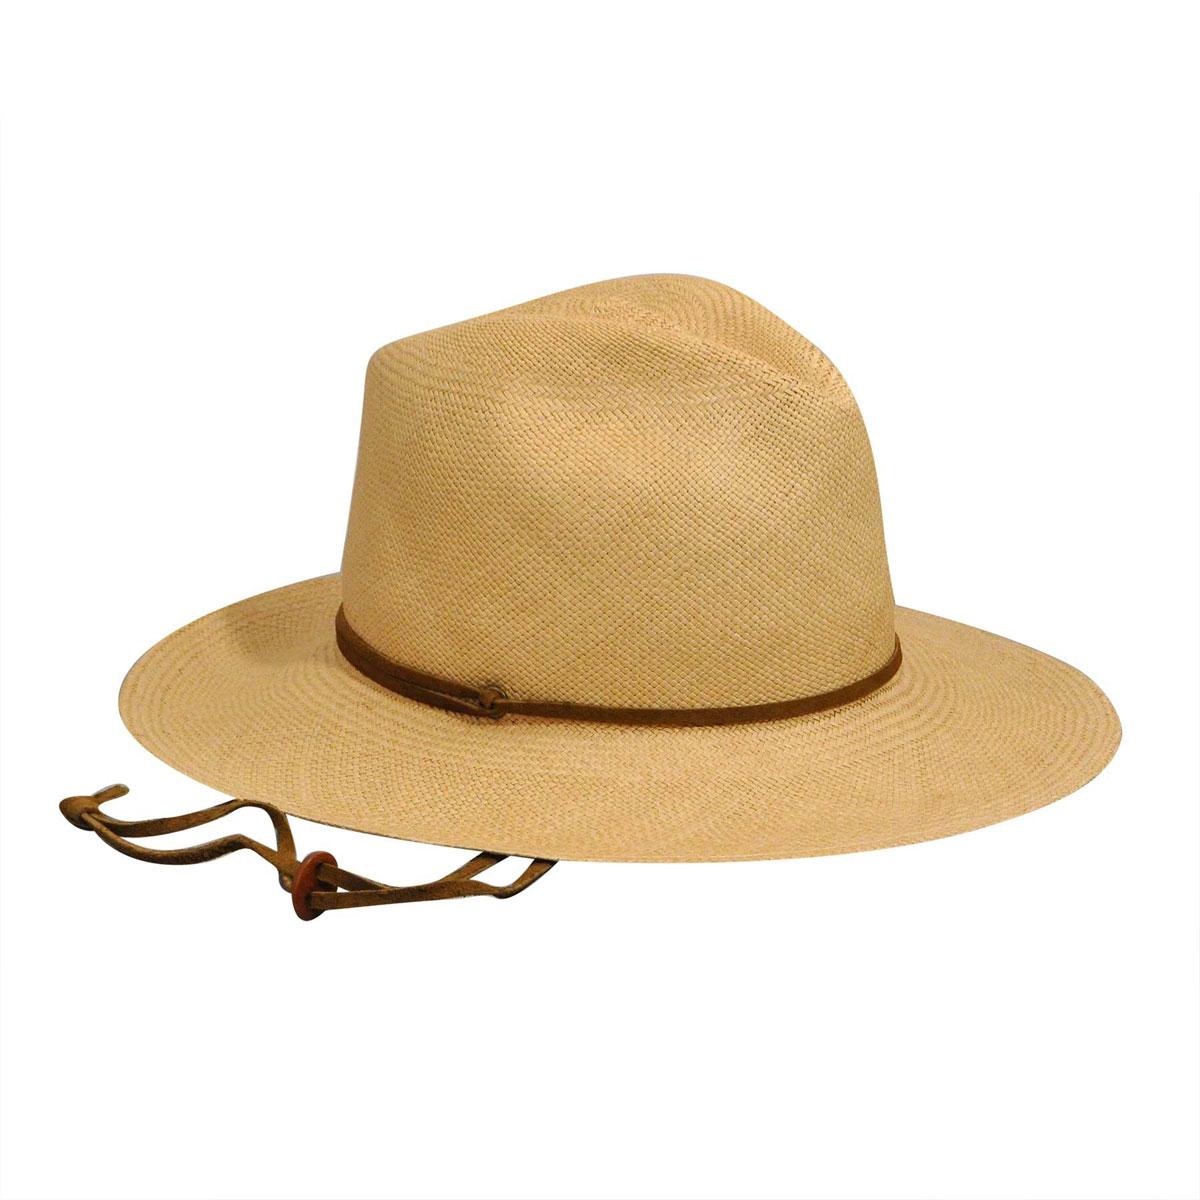 f04f1228f61bc Pantropic Mens Fedora Explorer Straw Wide Brim Hat 750660005111 L ...